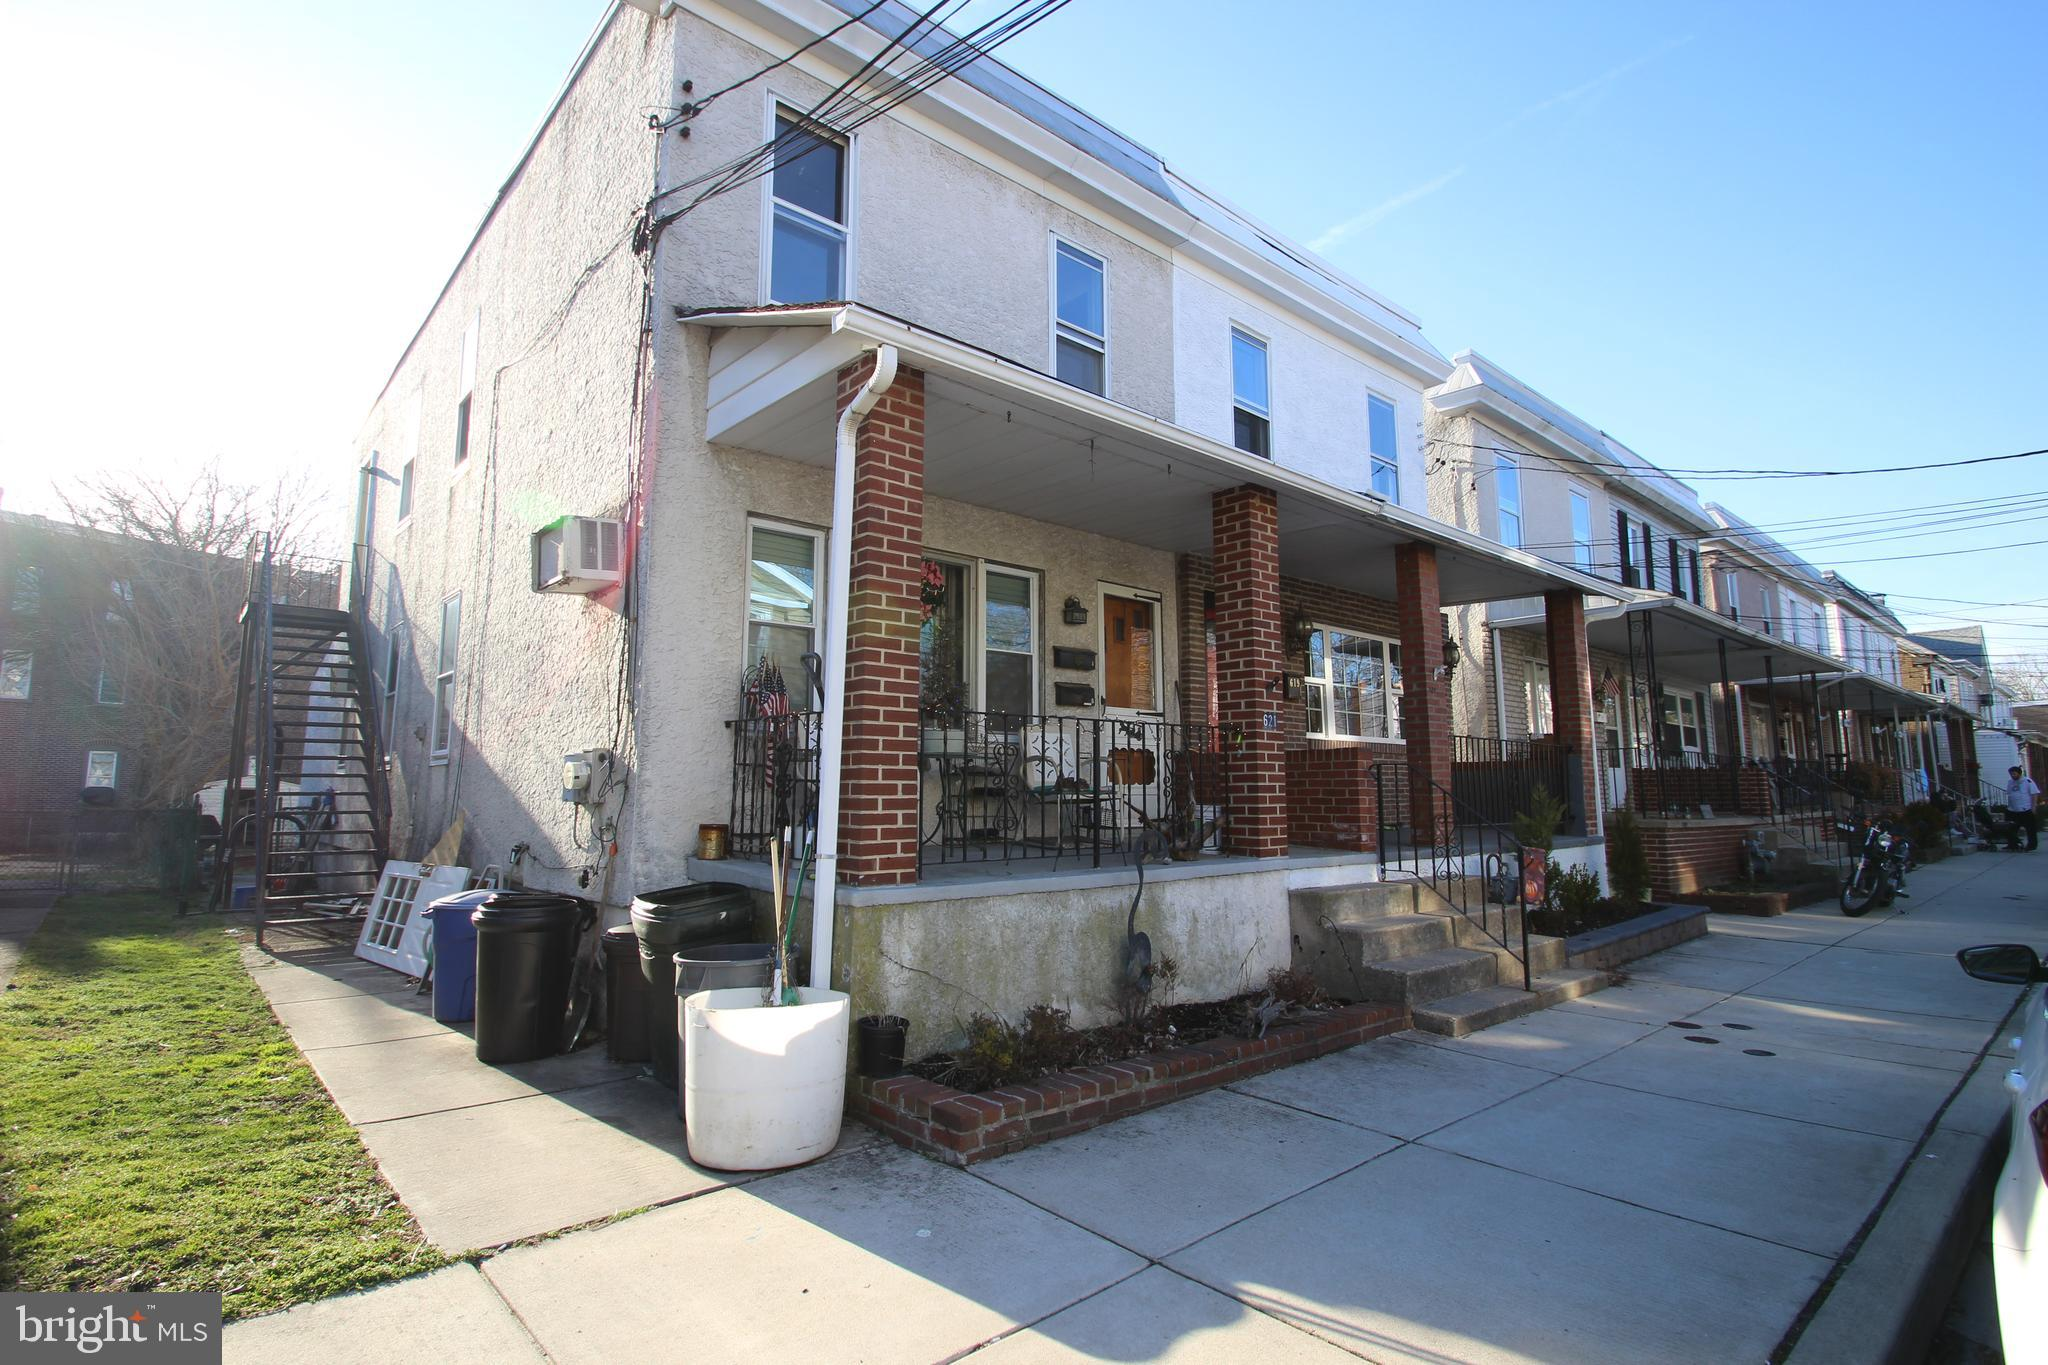 621 Maddock Street, Crum Lynne, PA 19022